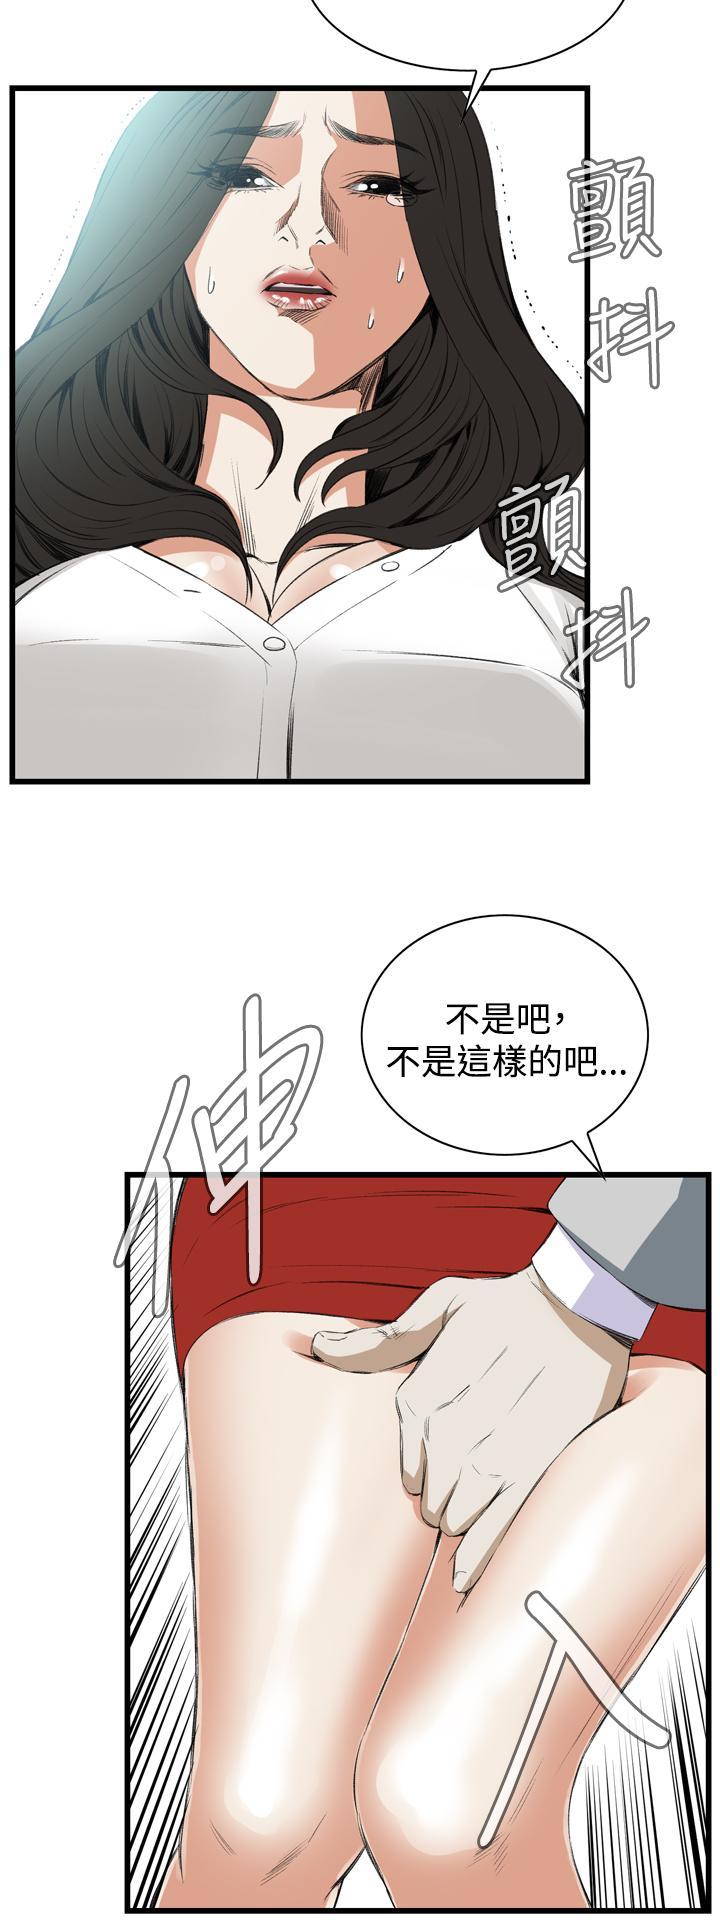 Take a Peek 偷窥 Ch.39~60 [Chinese]中文 308